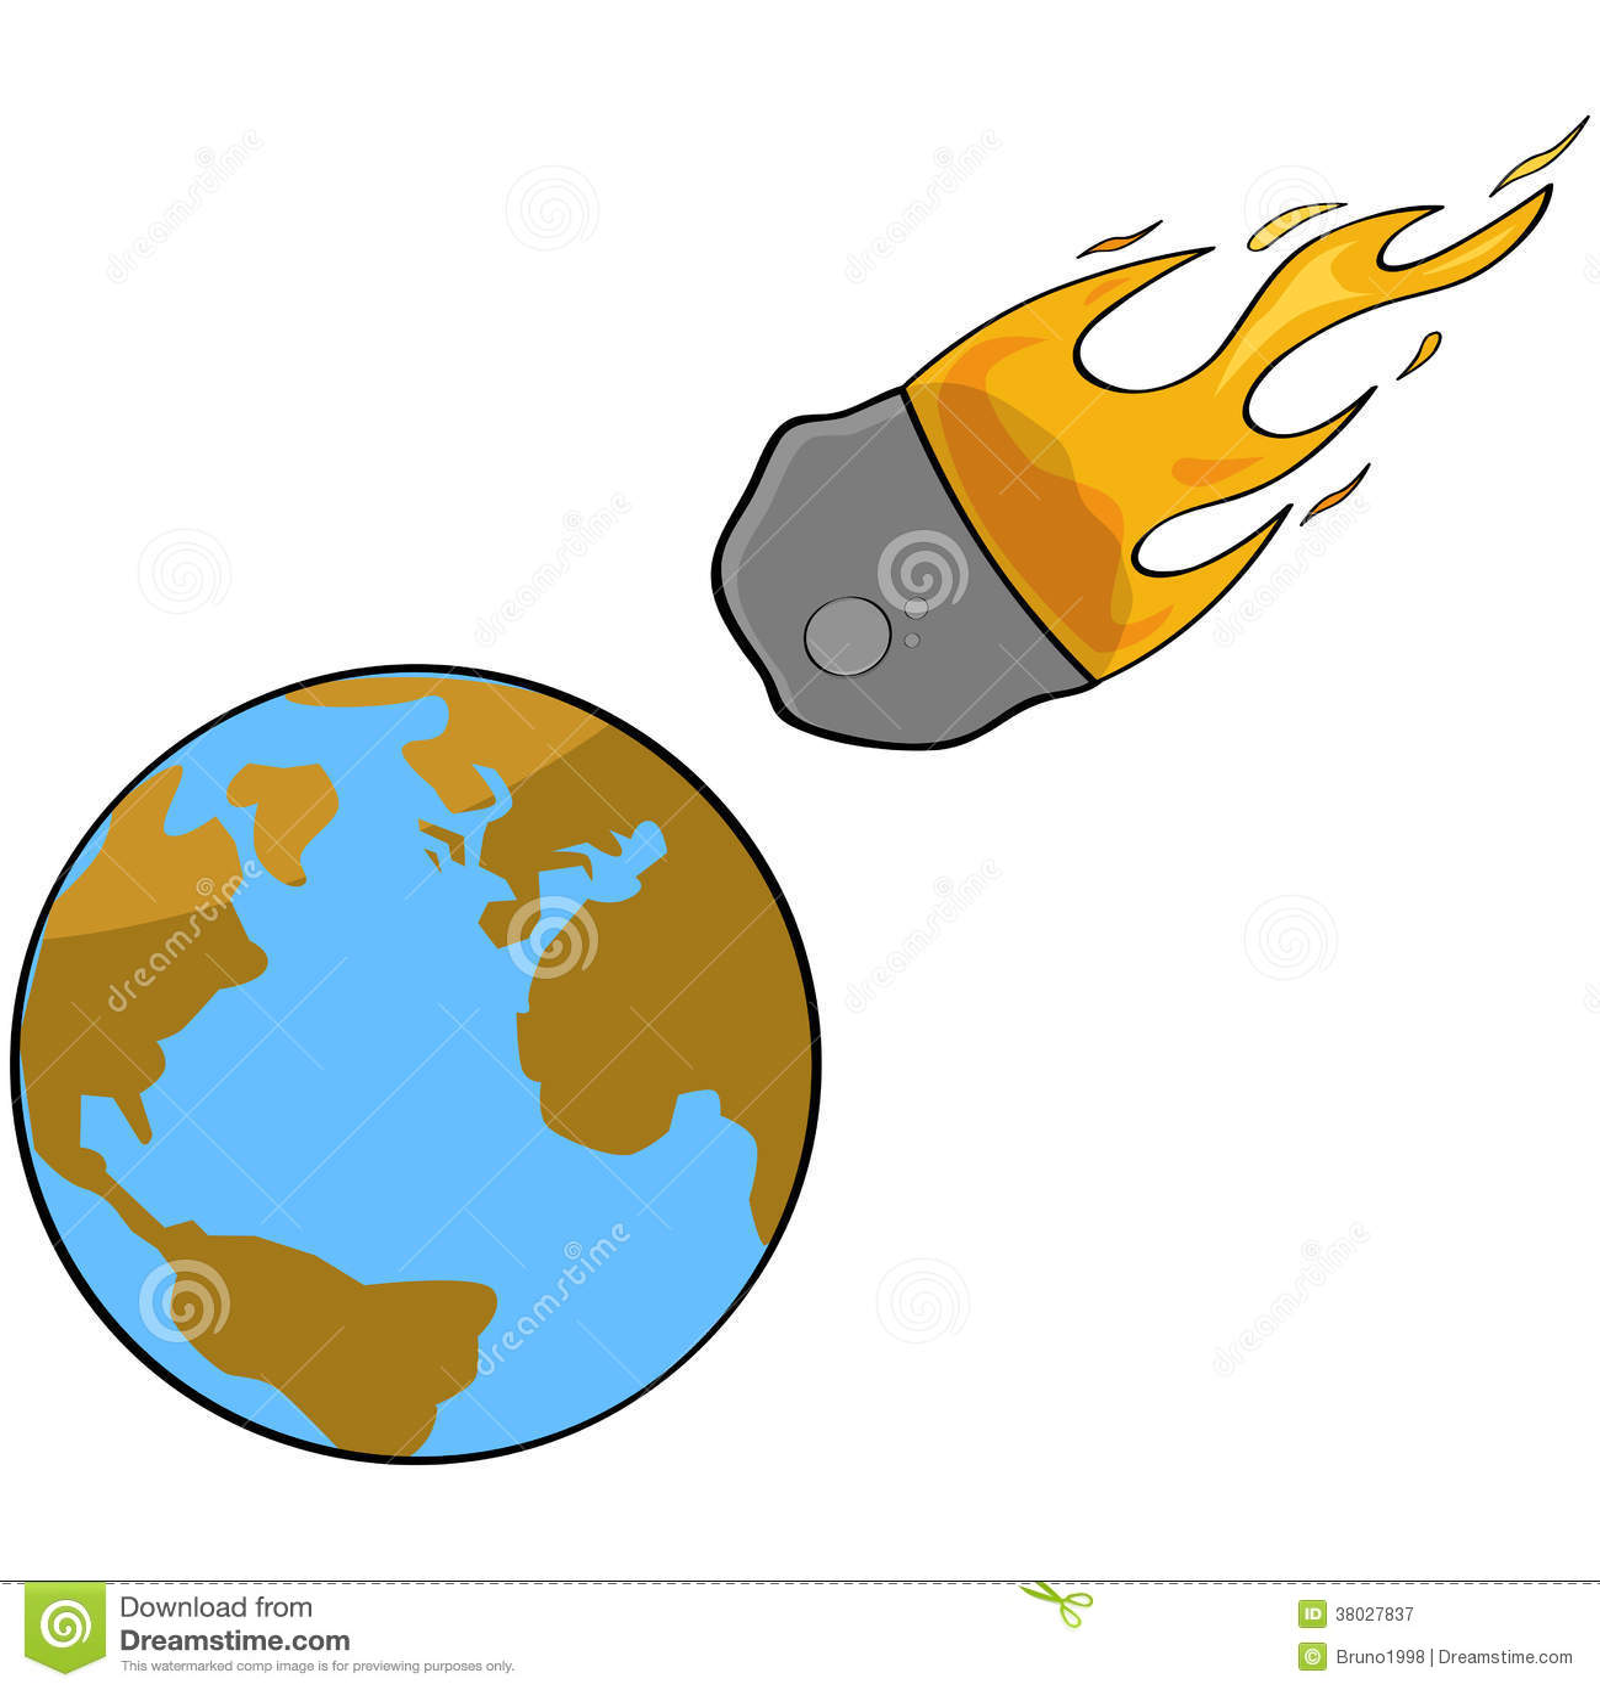 asteroid collision stock illustrations 617 asteroid collision rh dreamstime com